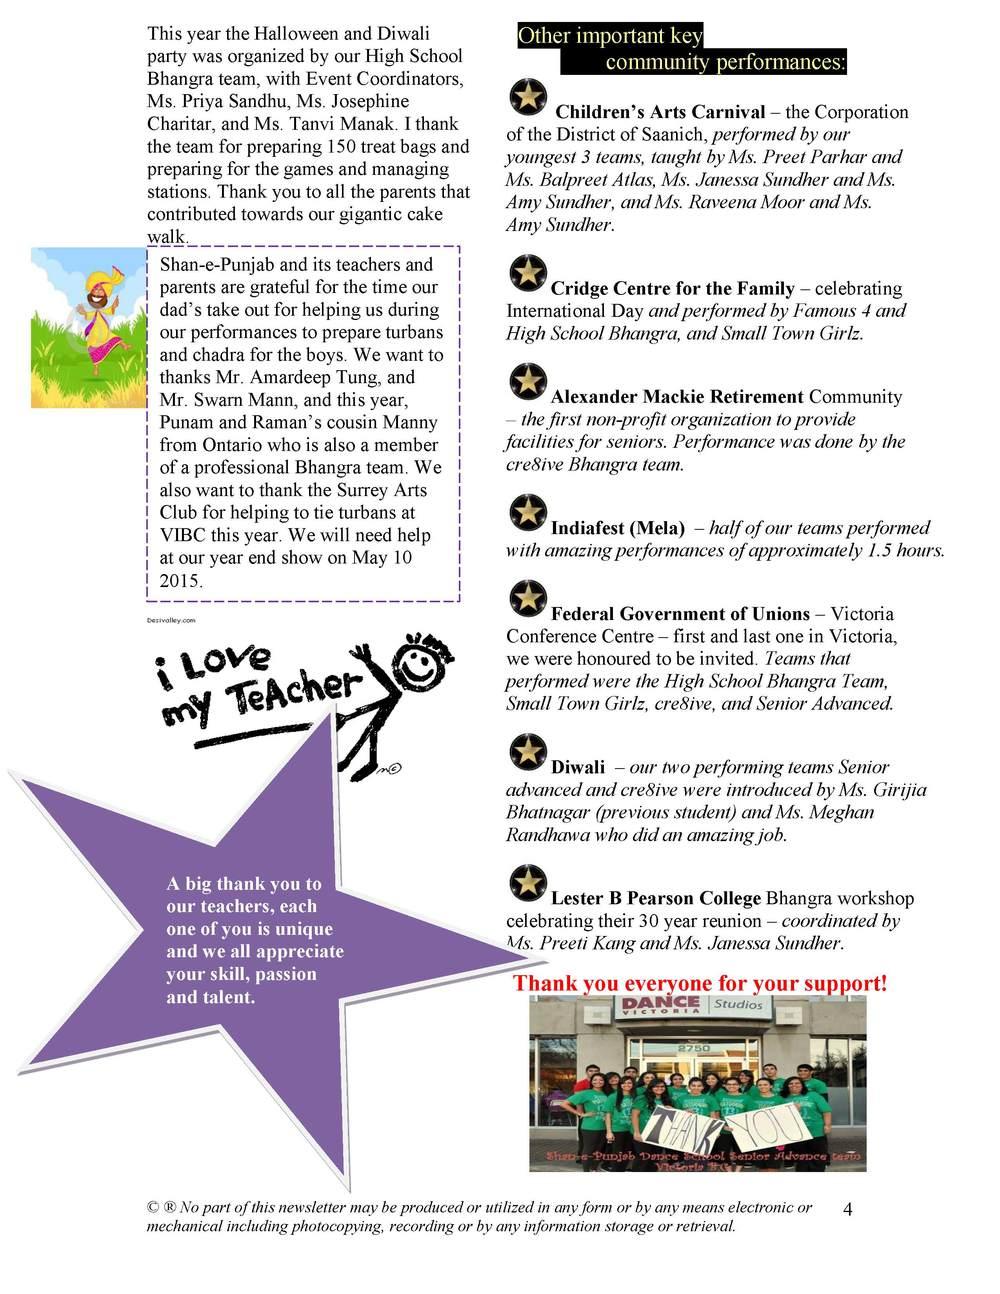 Newsletter_Volume 10_2014 FINAL_Page_4.jpg